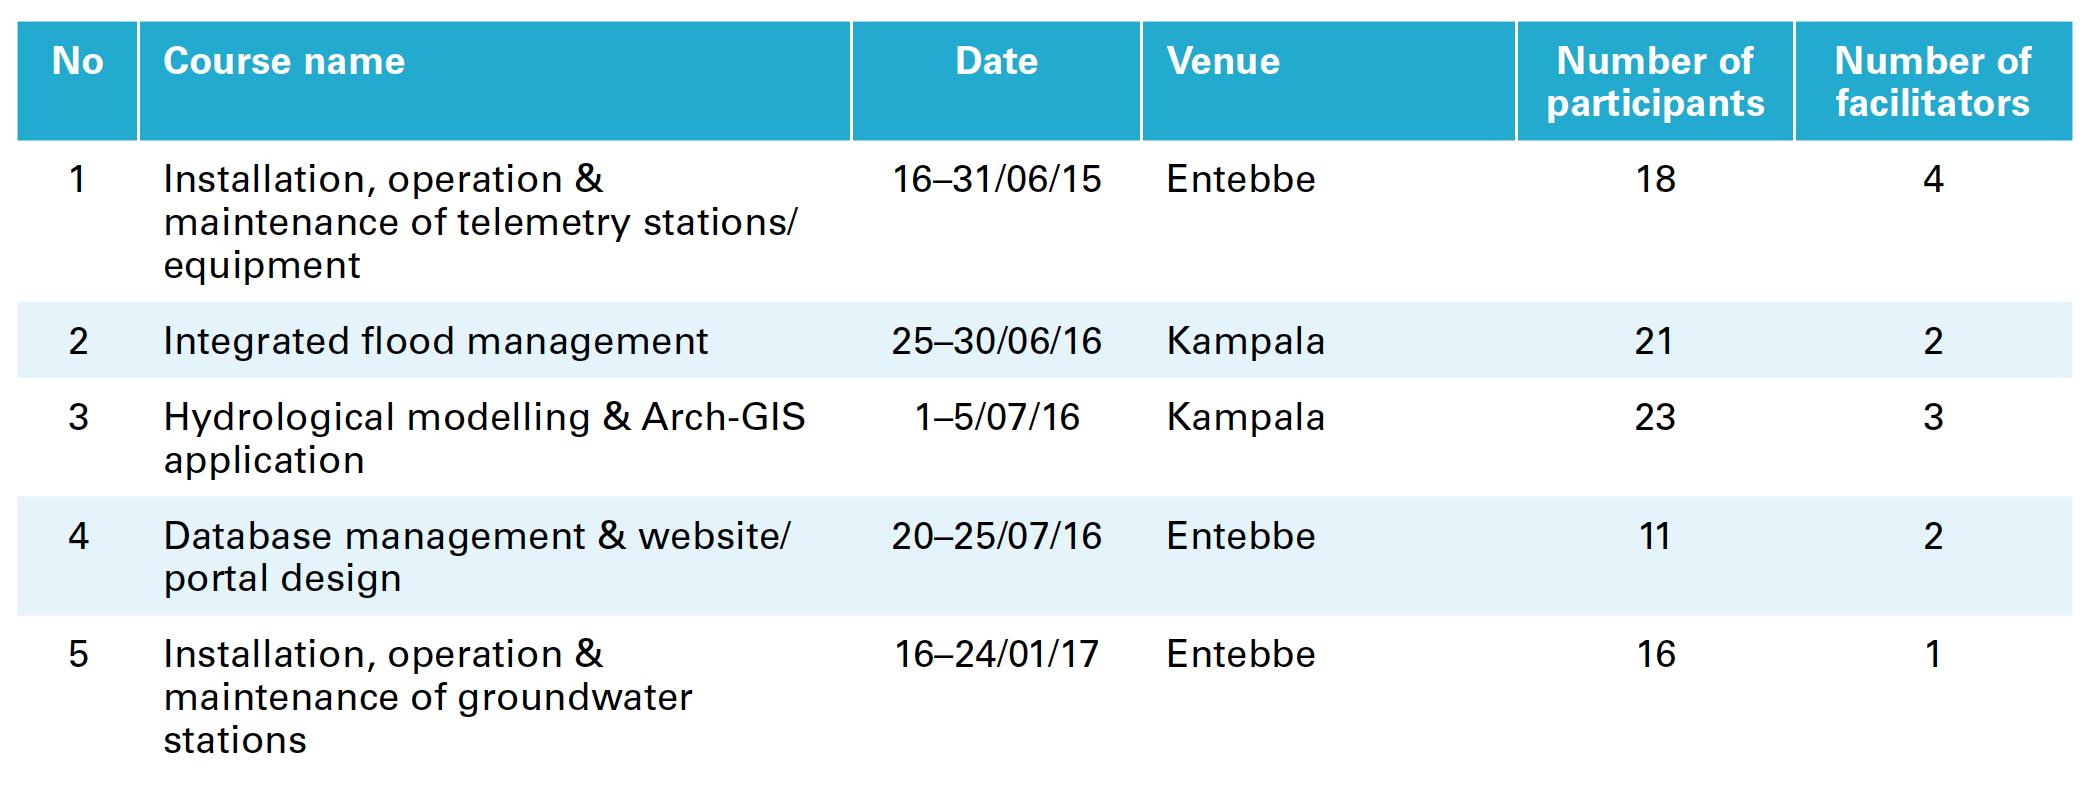 National training programmes in Uganda